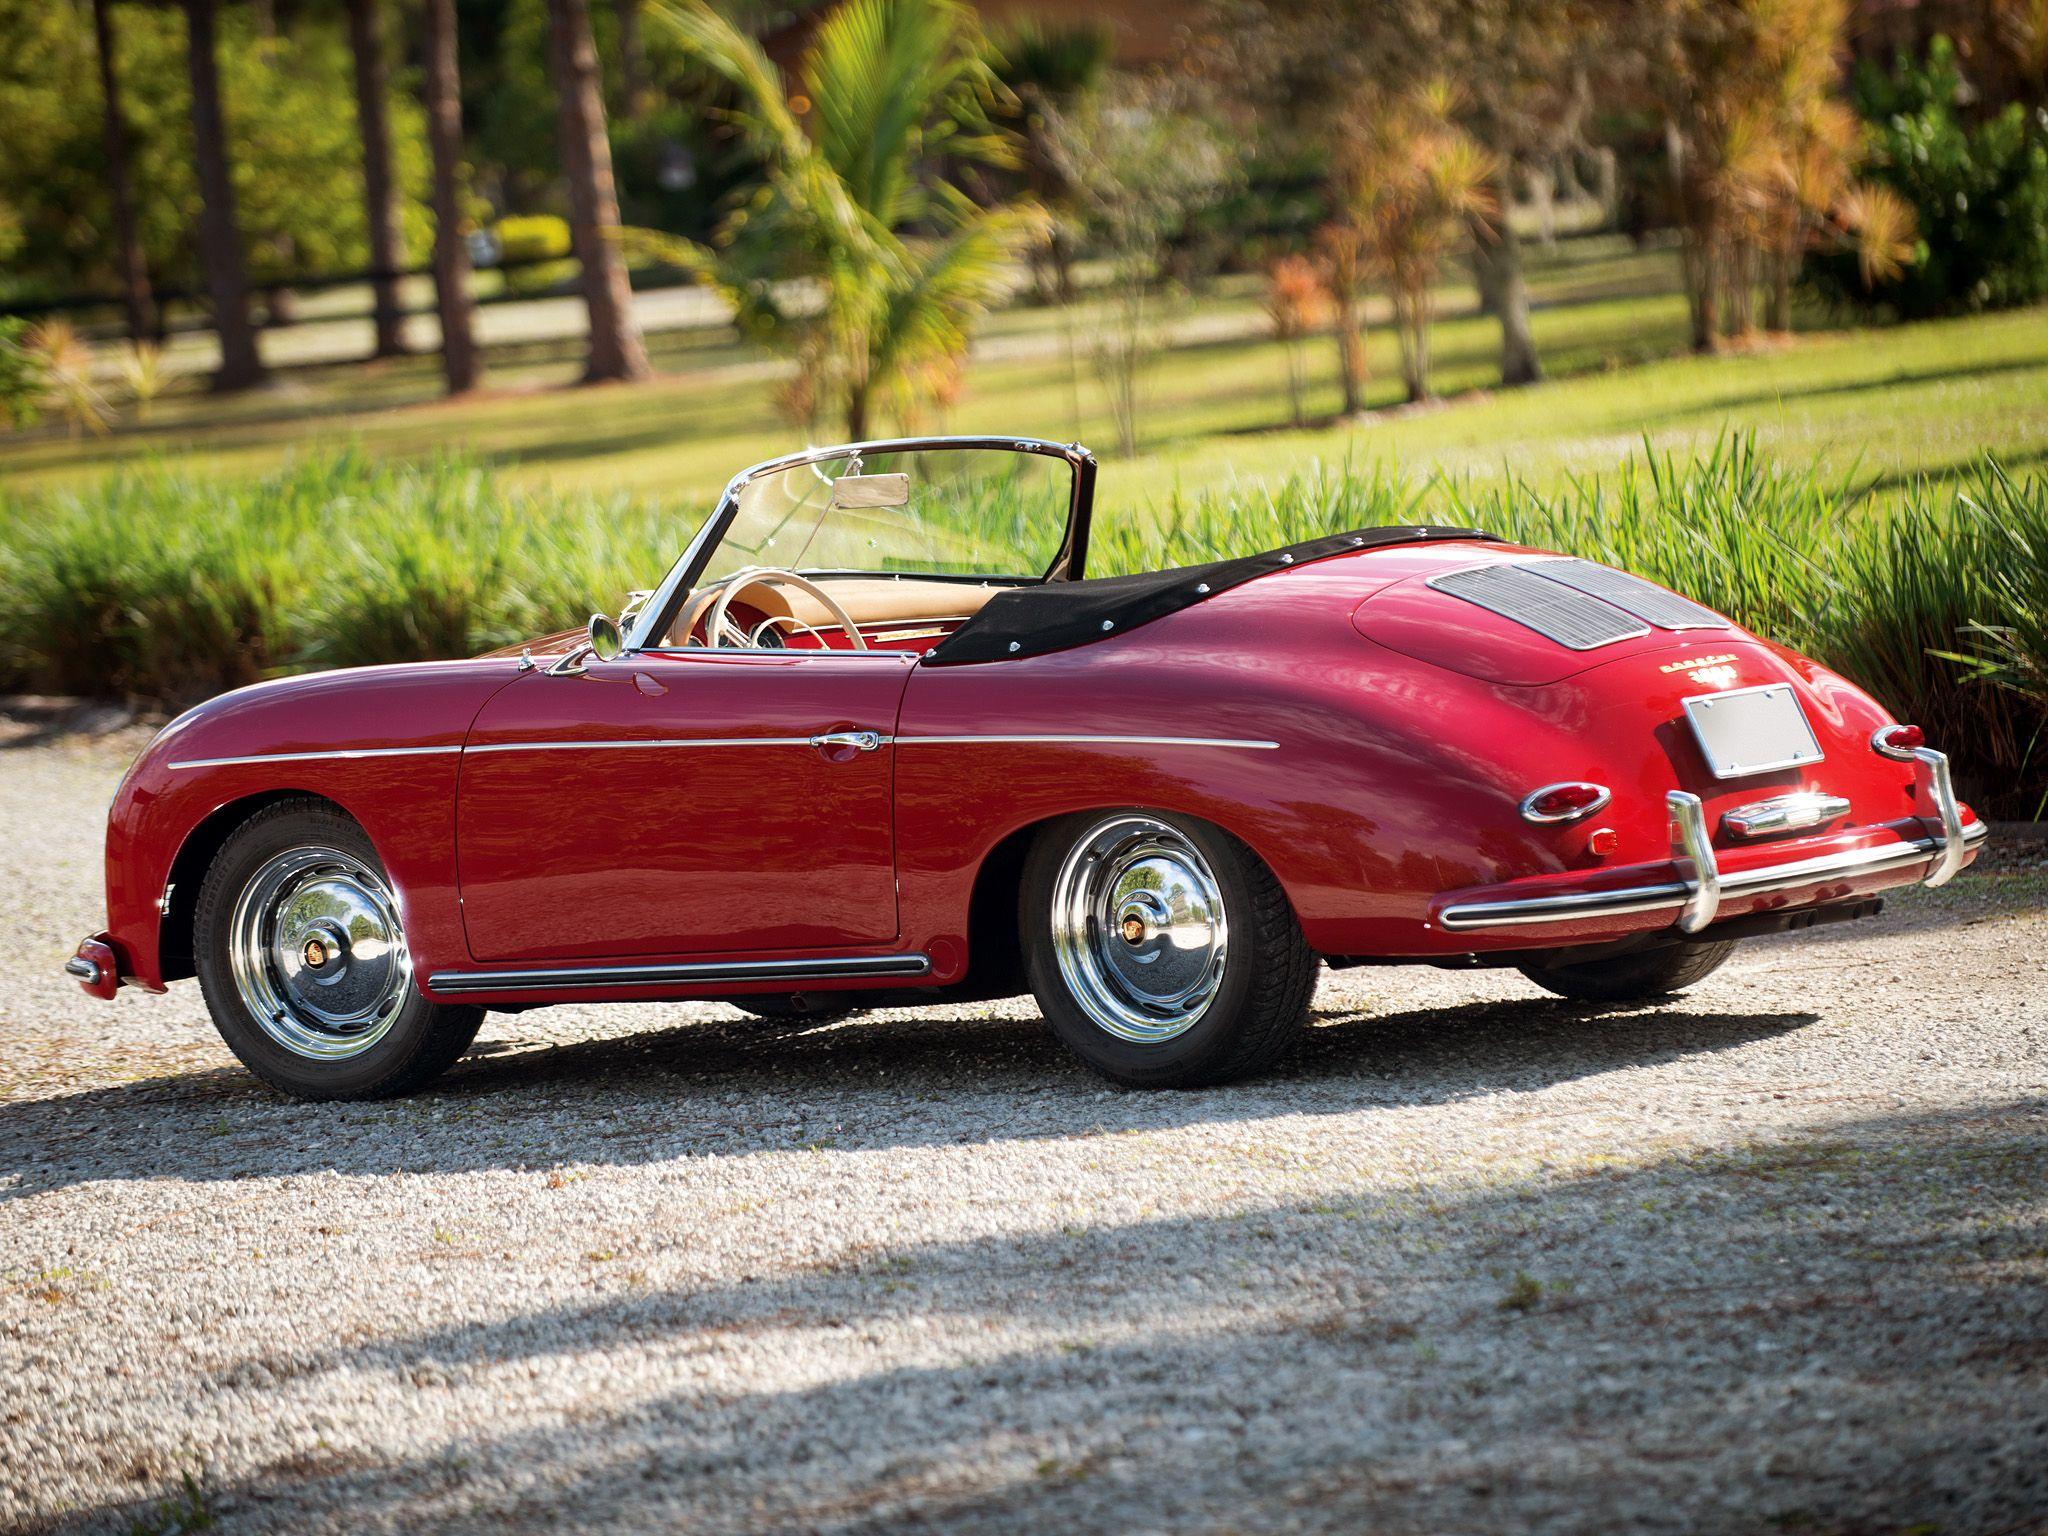 Porsche 356a 1600 Super Roadster By Reutter Us Spec T2 1958 59 Porsche 356a Porsche Roadsters